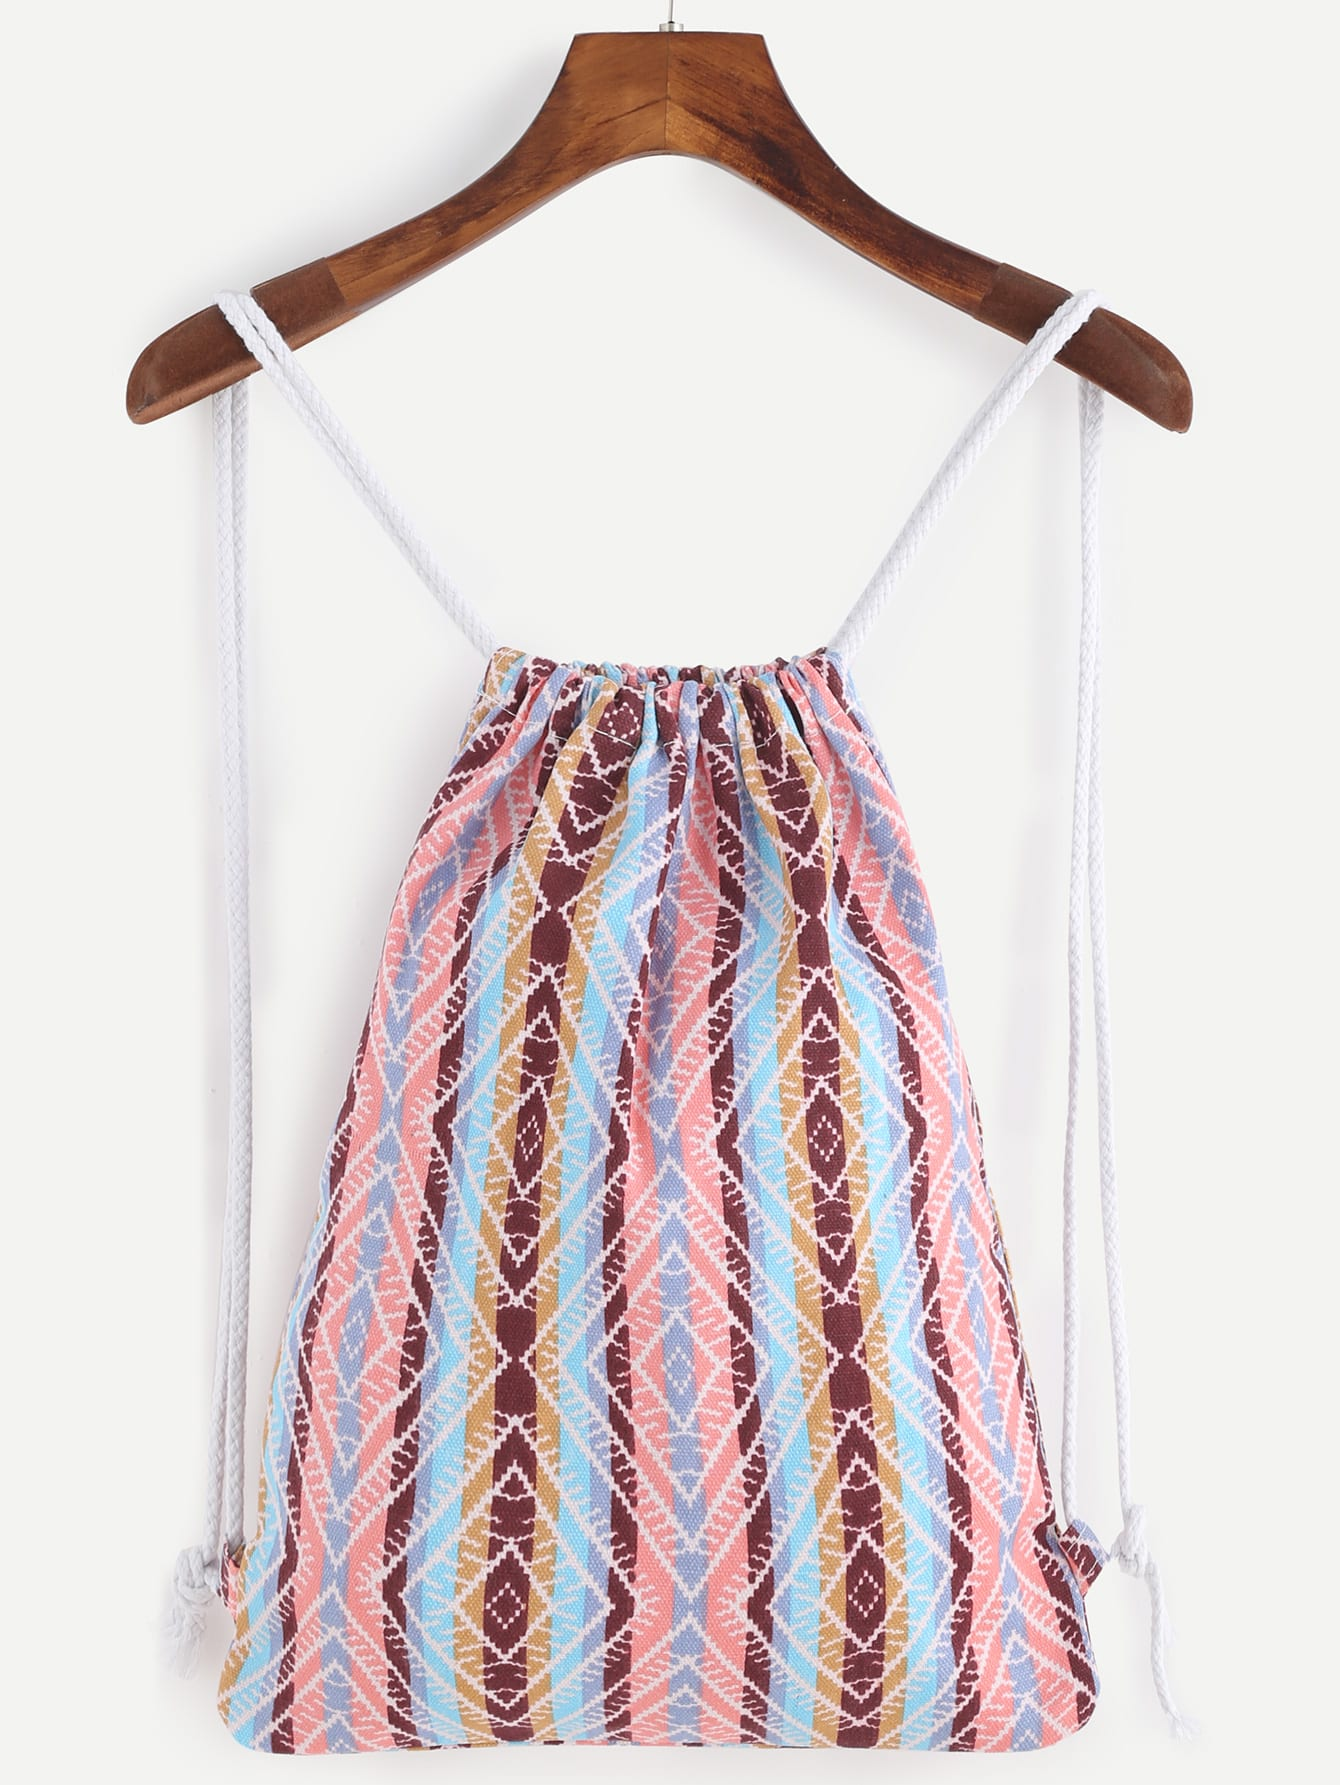 Multicolored Stripe Canvas Bucket Backpack With Rope StrapMulticolored Stripe Canvas Bucket Backpack With Rope Strap<br><br>color: Multi<br>size: None